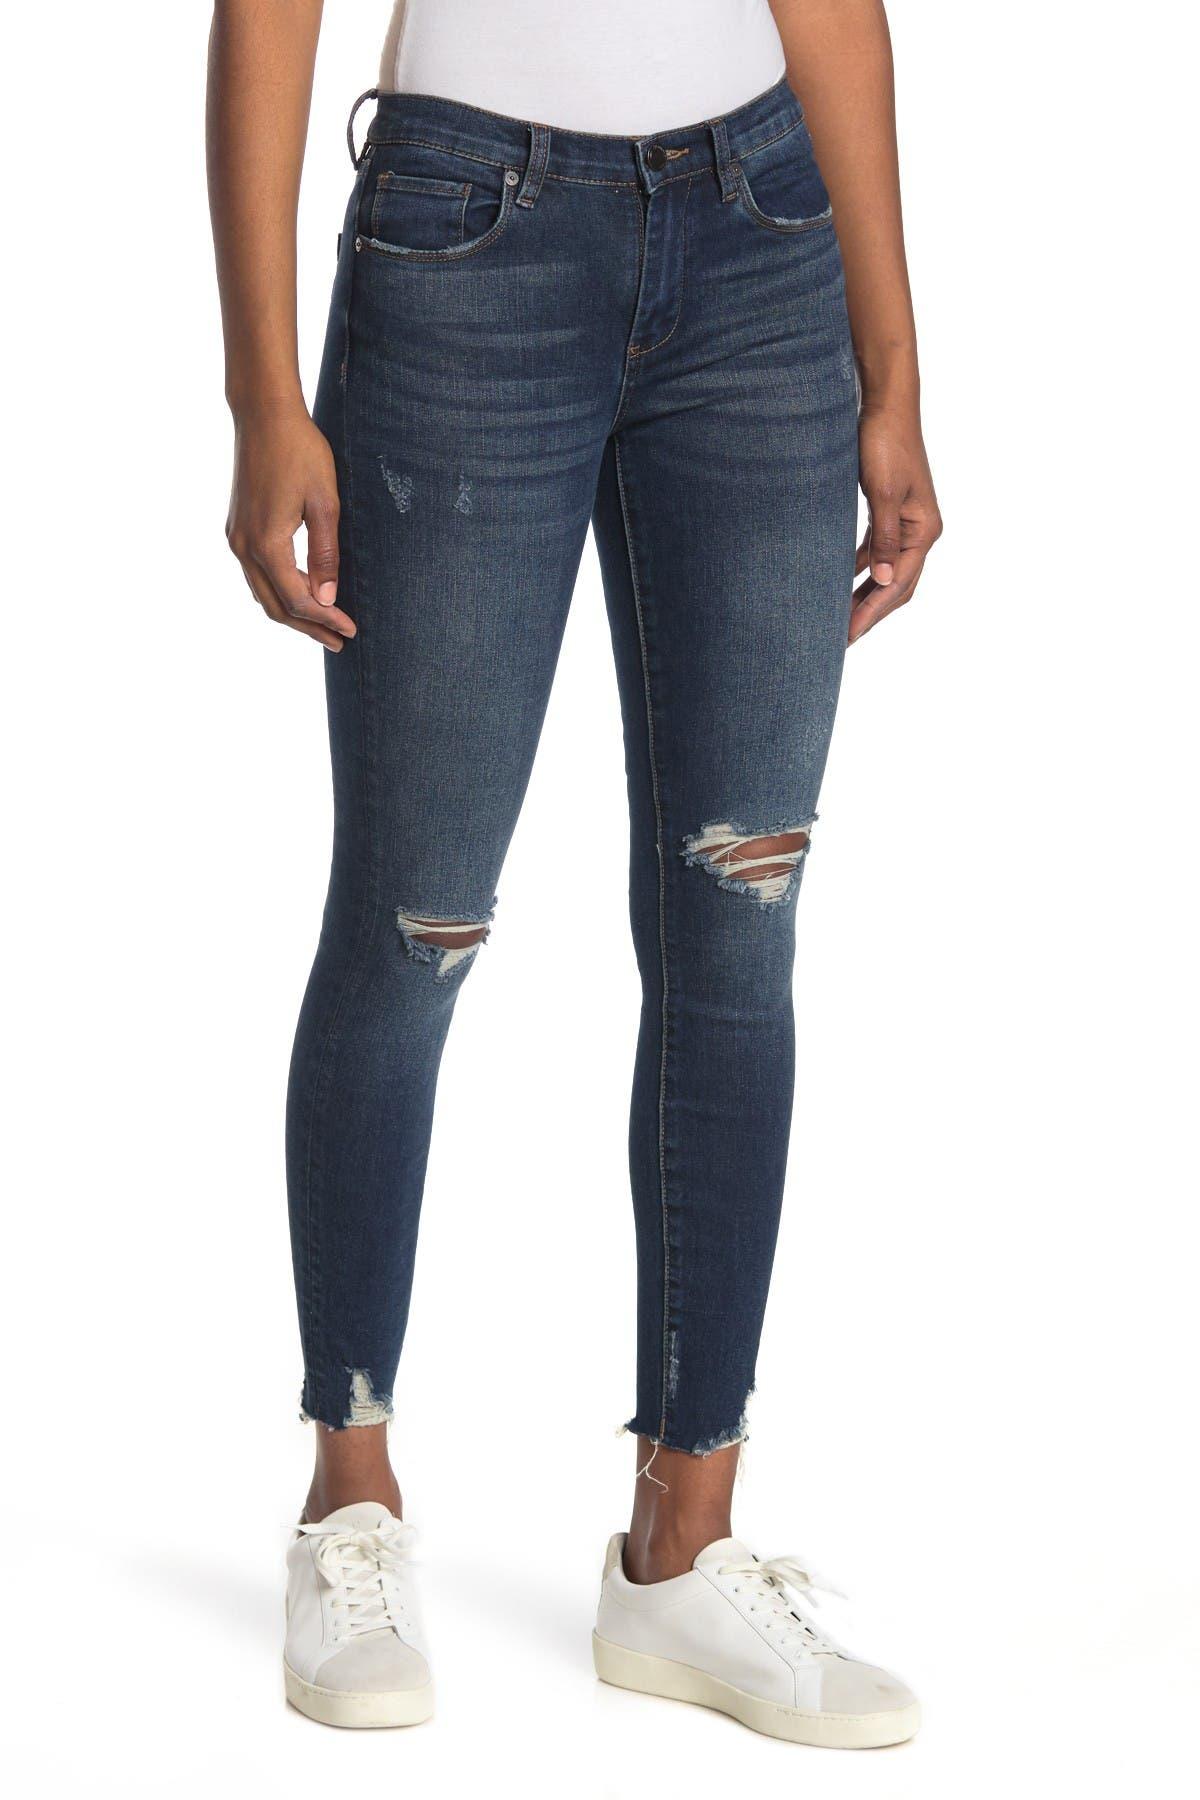 Image of BLANKNYC Denim The Bond Mid Rise Skinny Jeans